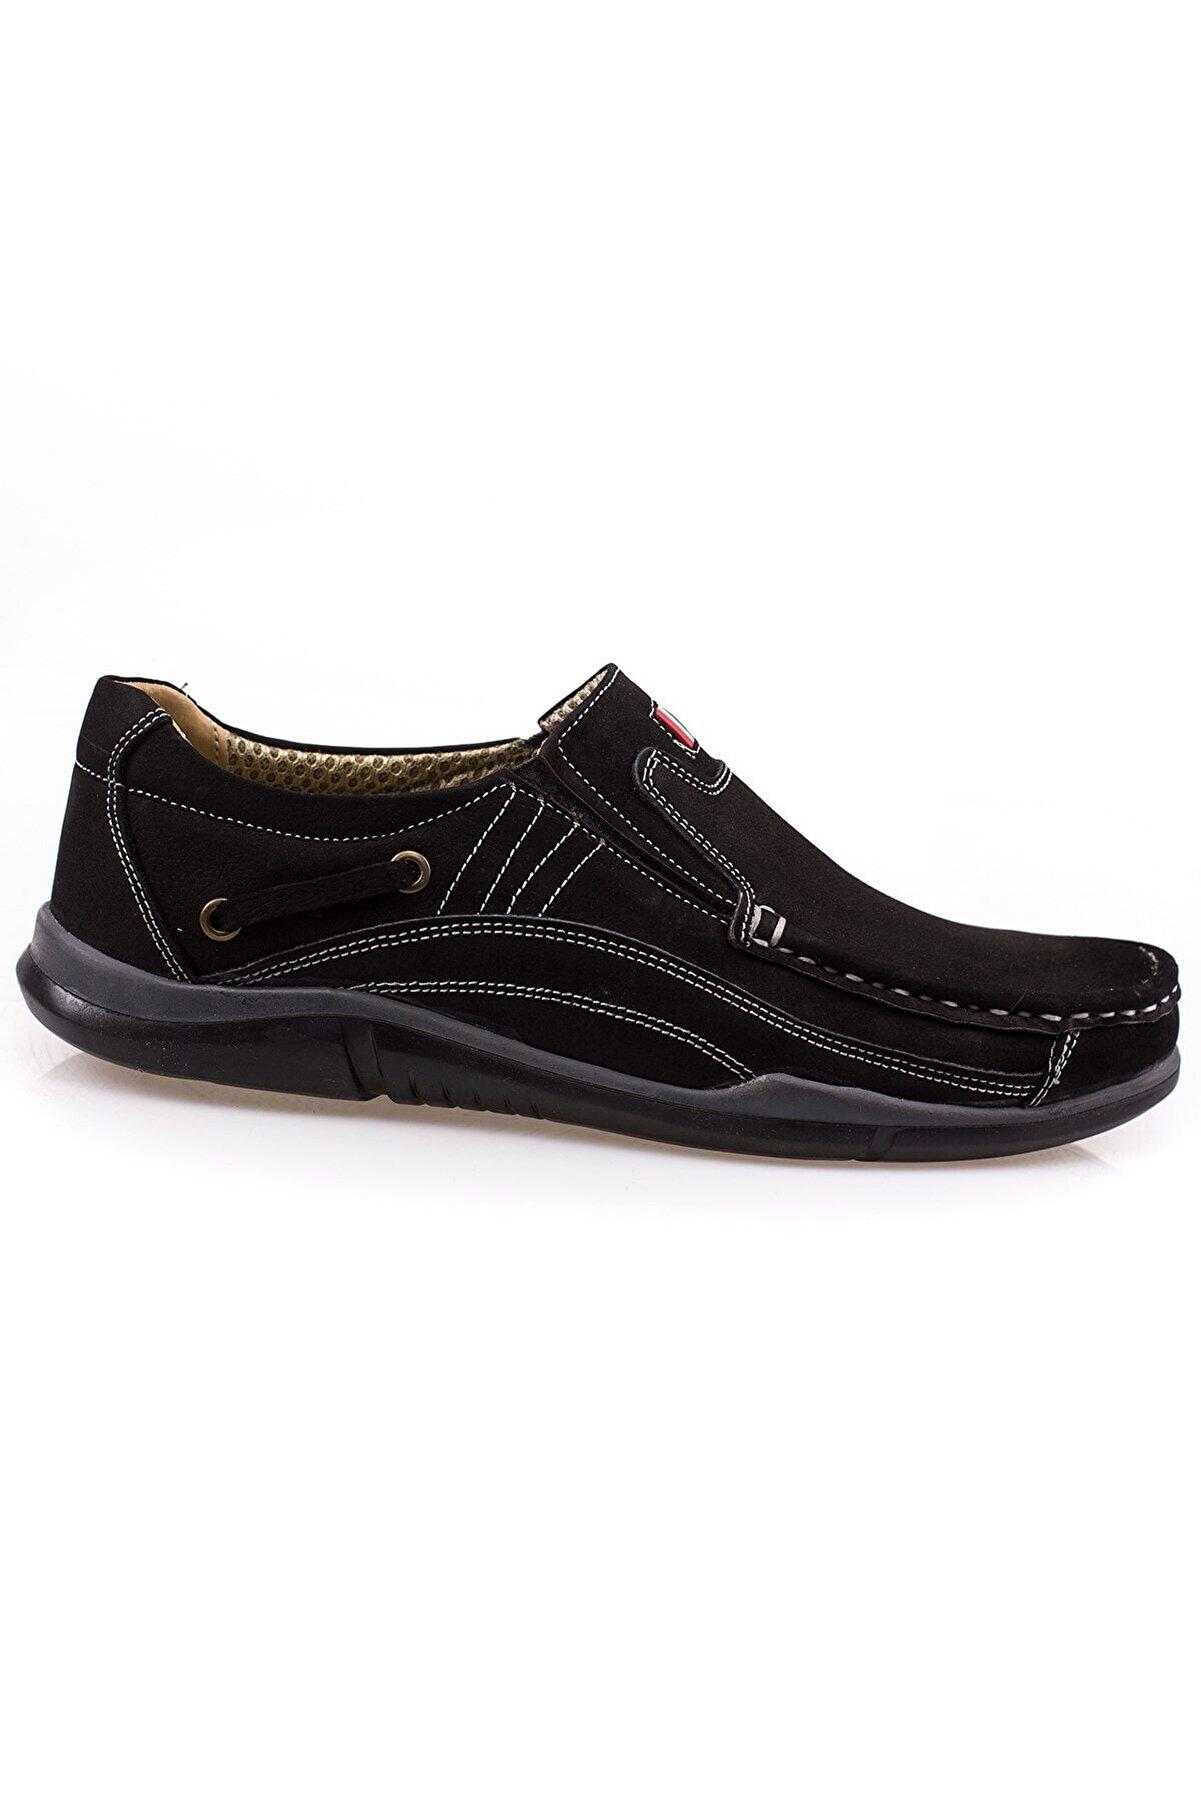 maximoda Erkek Siyah Hakiki Nubuk Deri Loafer Ayakkabı